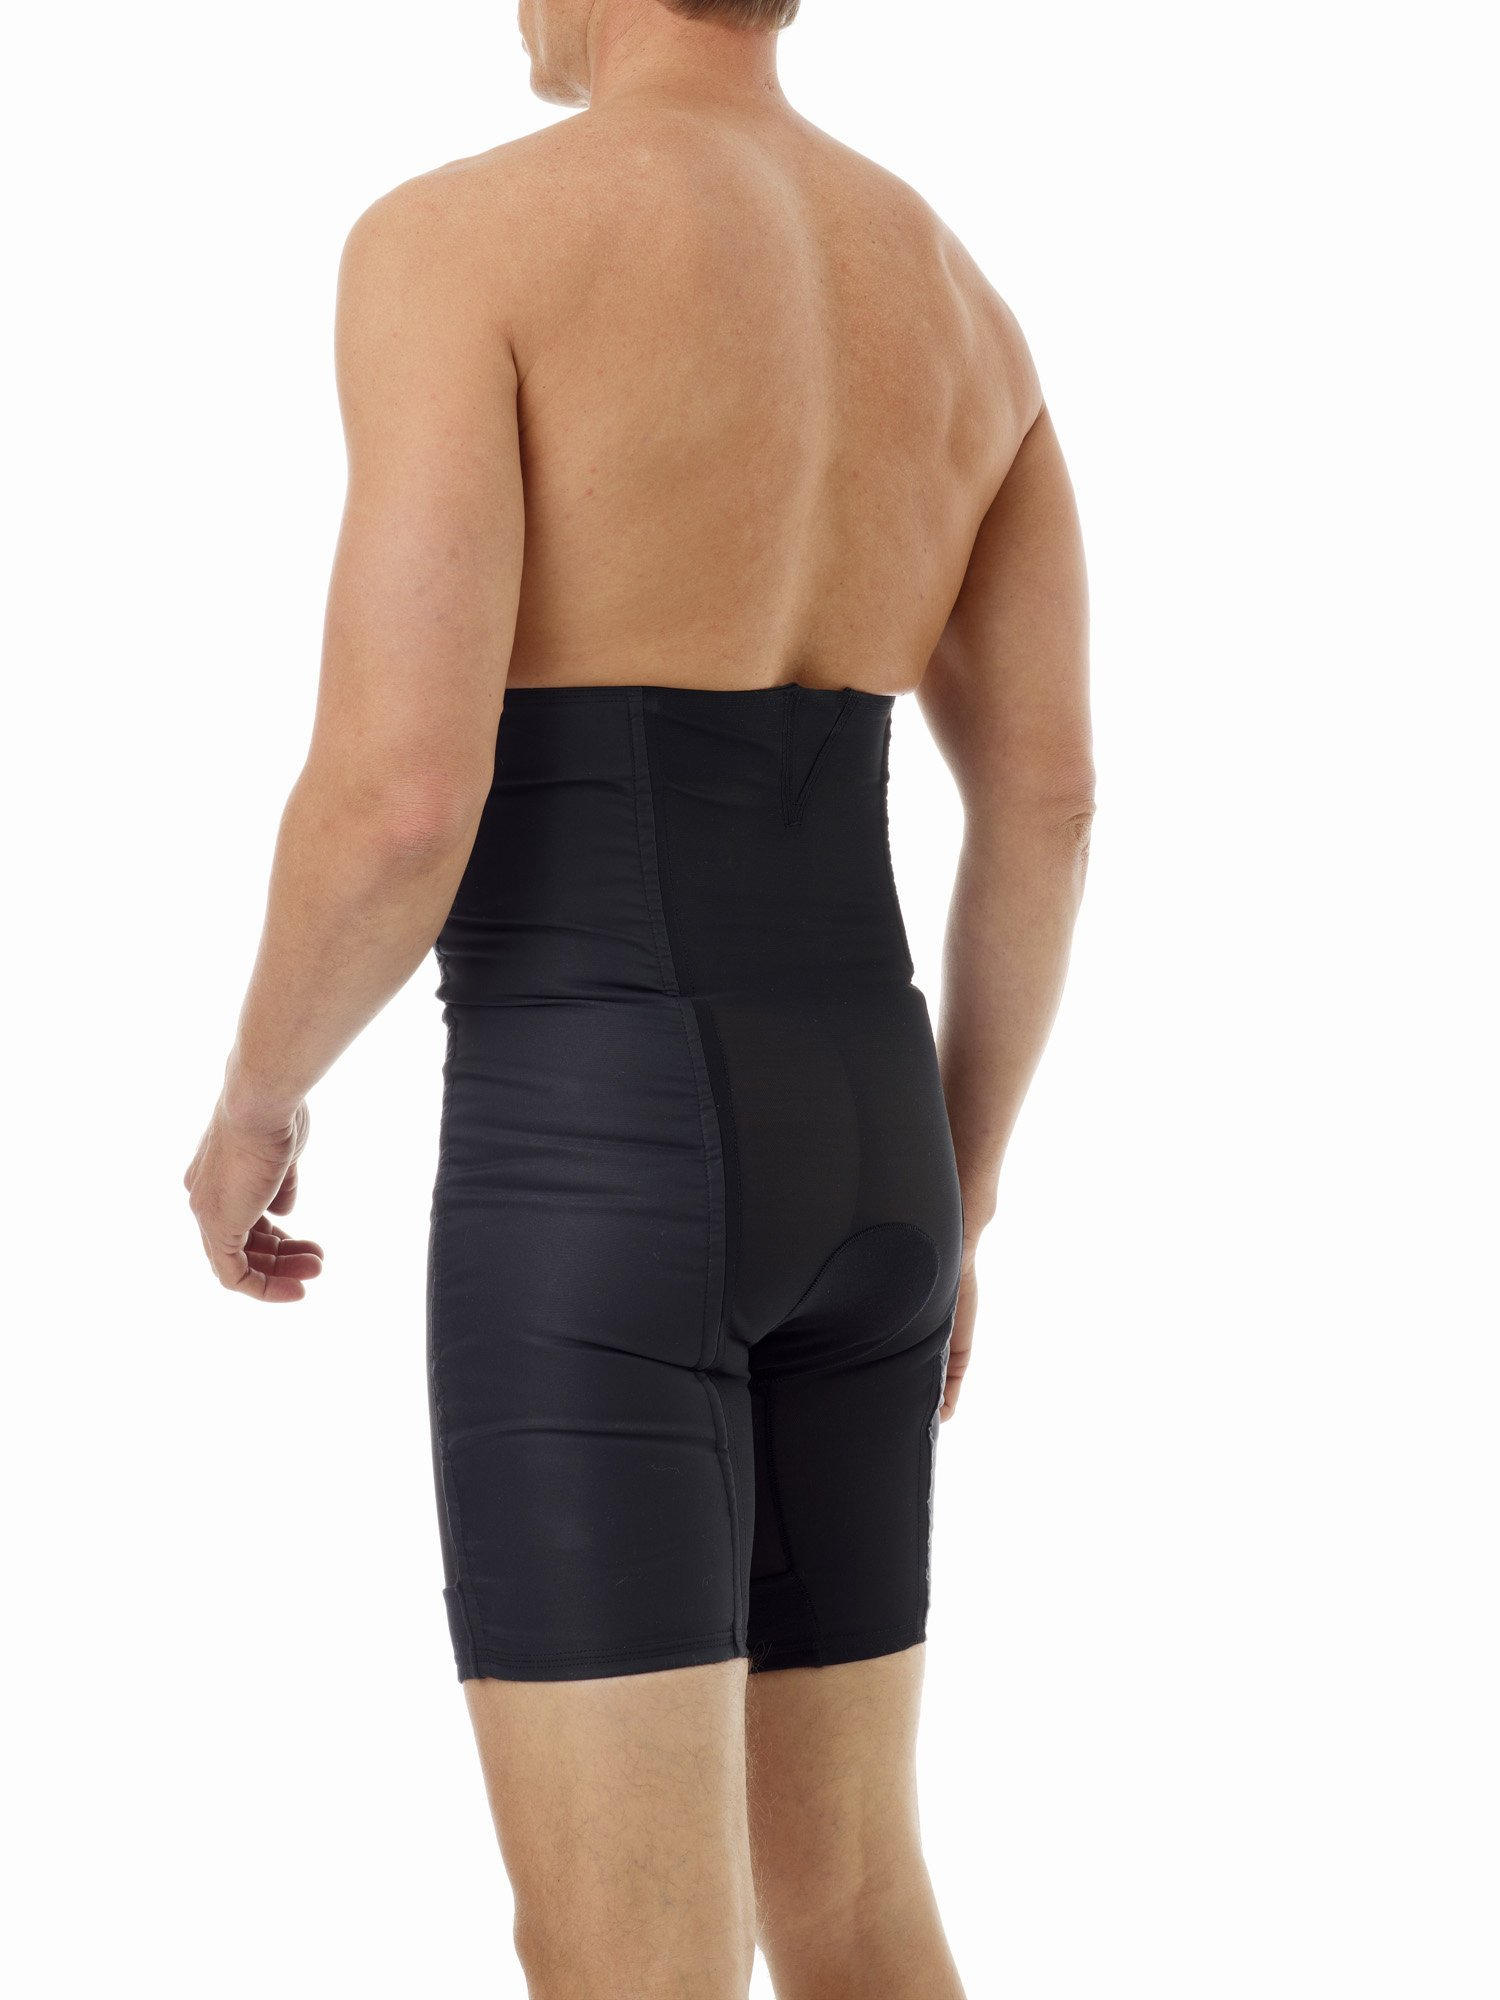 Underworks Men's Power Shaper Long Leg Brief Girdle, Waistline - Medium 33-36, Black